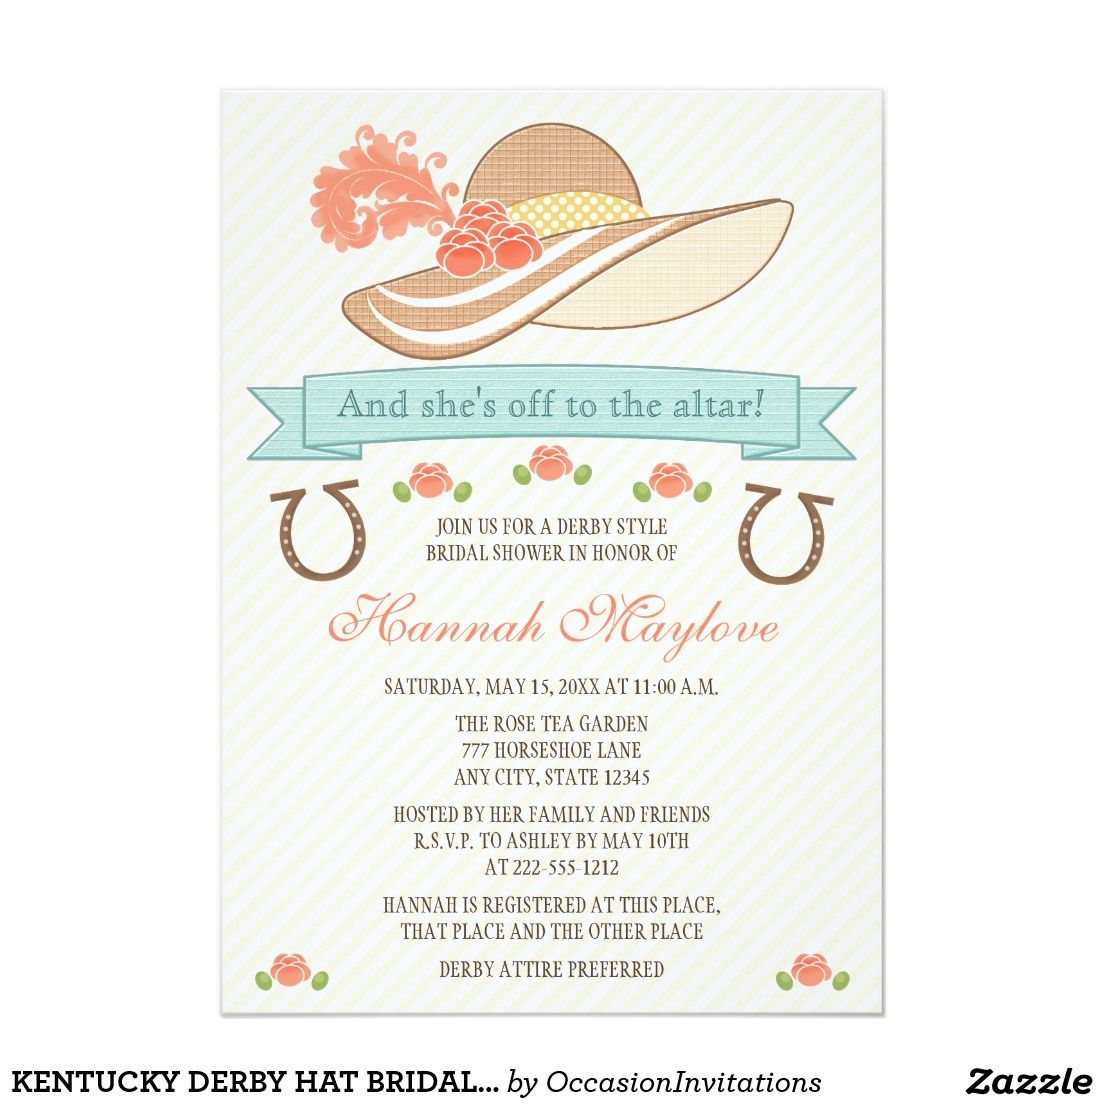 Kentucky derby hat bridal shower invitation | Bridal Shower ...